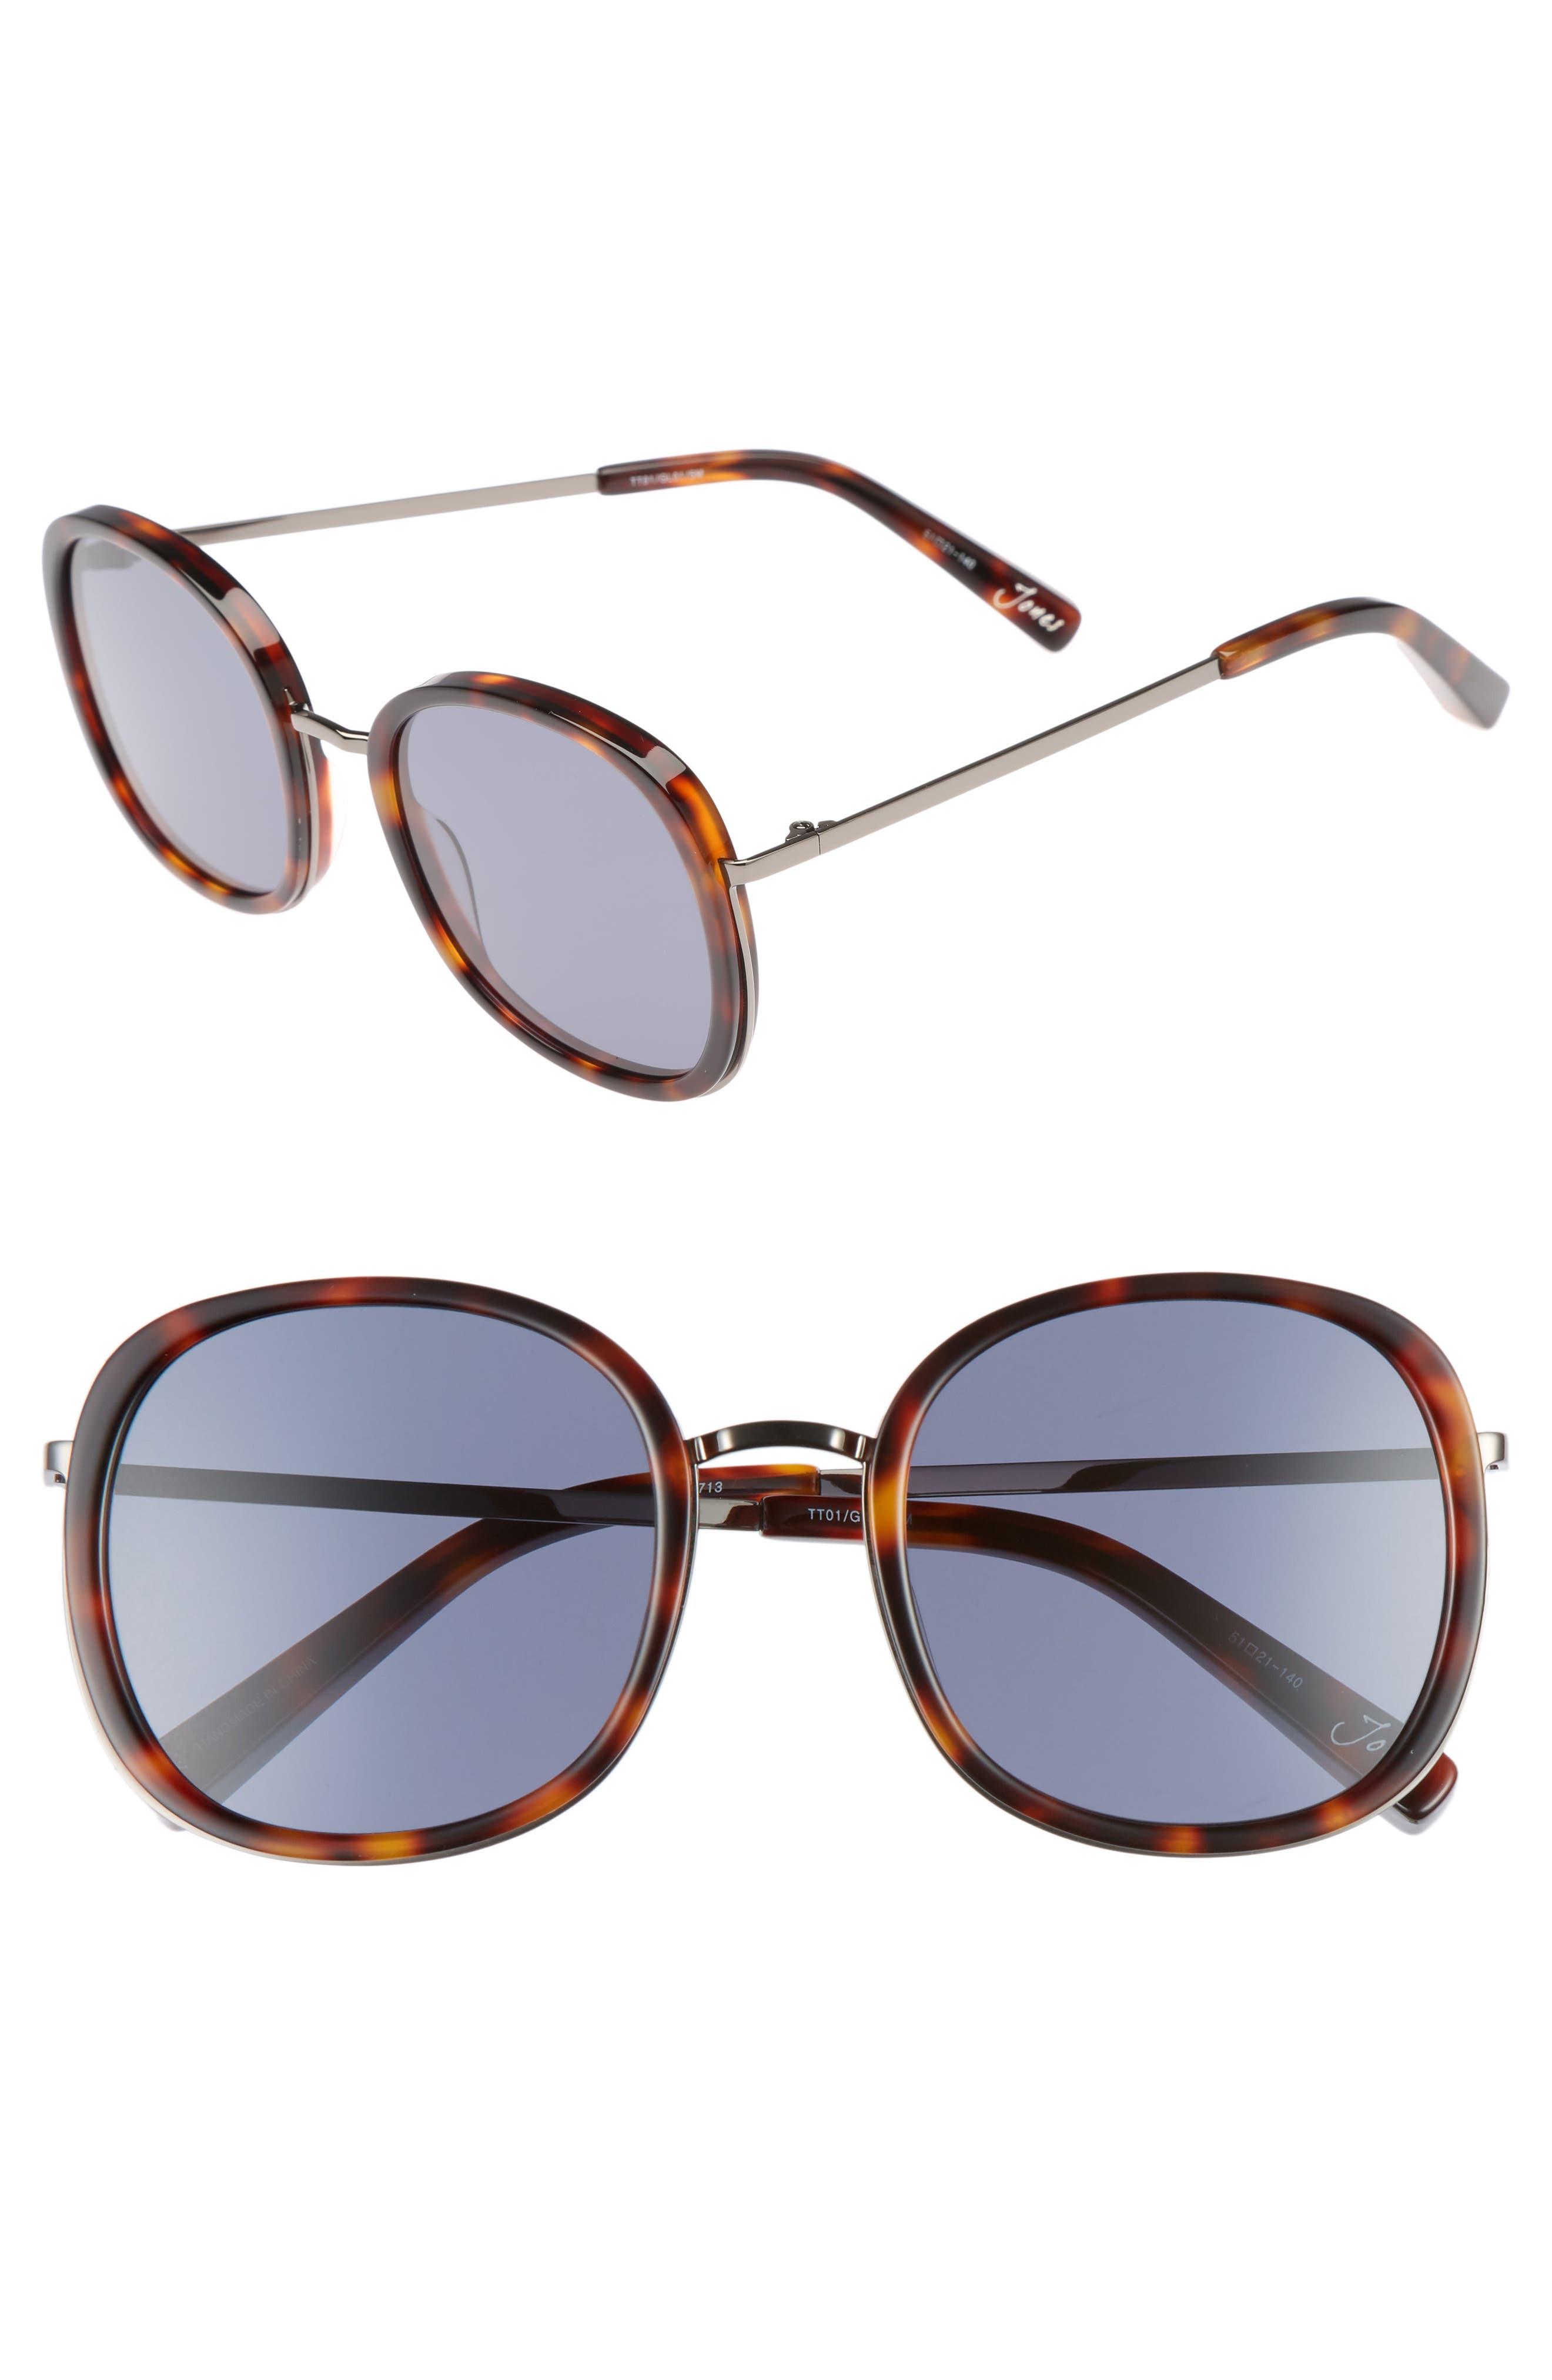 Alternate Image 1 Selected - Elizabeth and James Jones 51mm Round Sunglasses